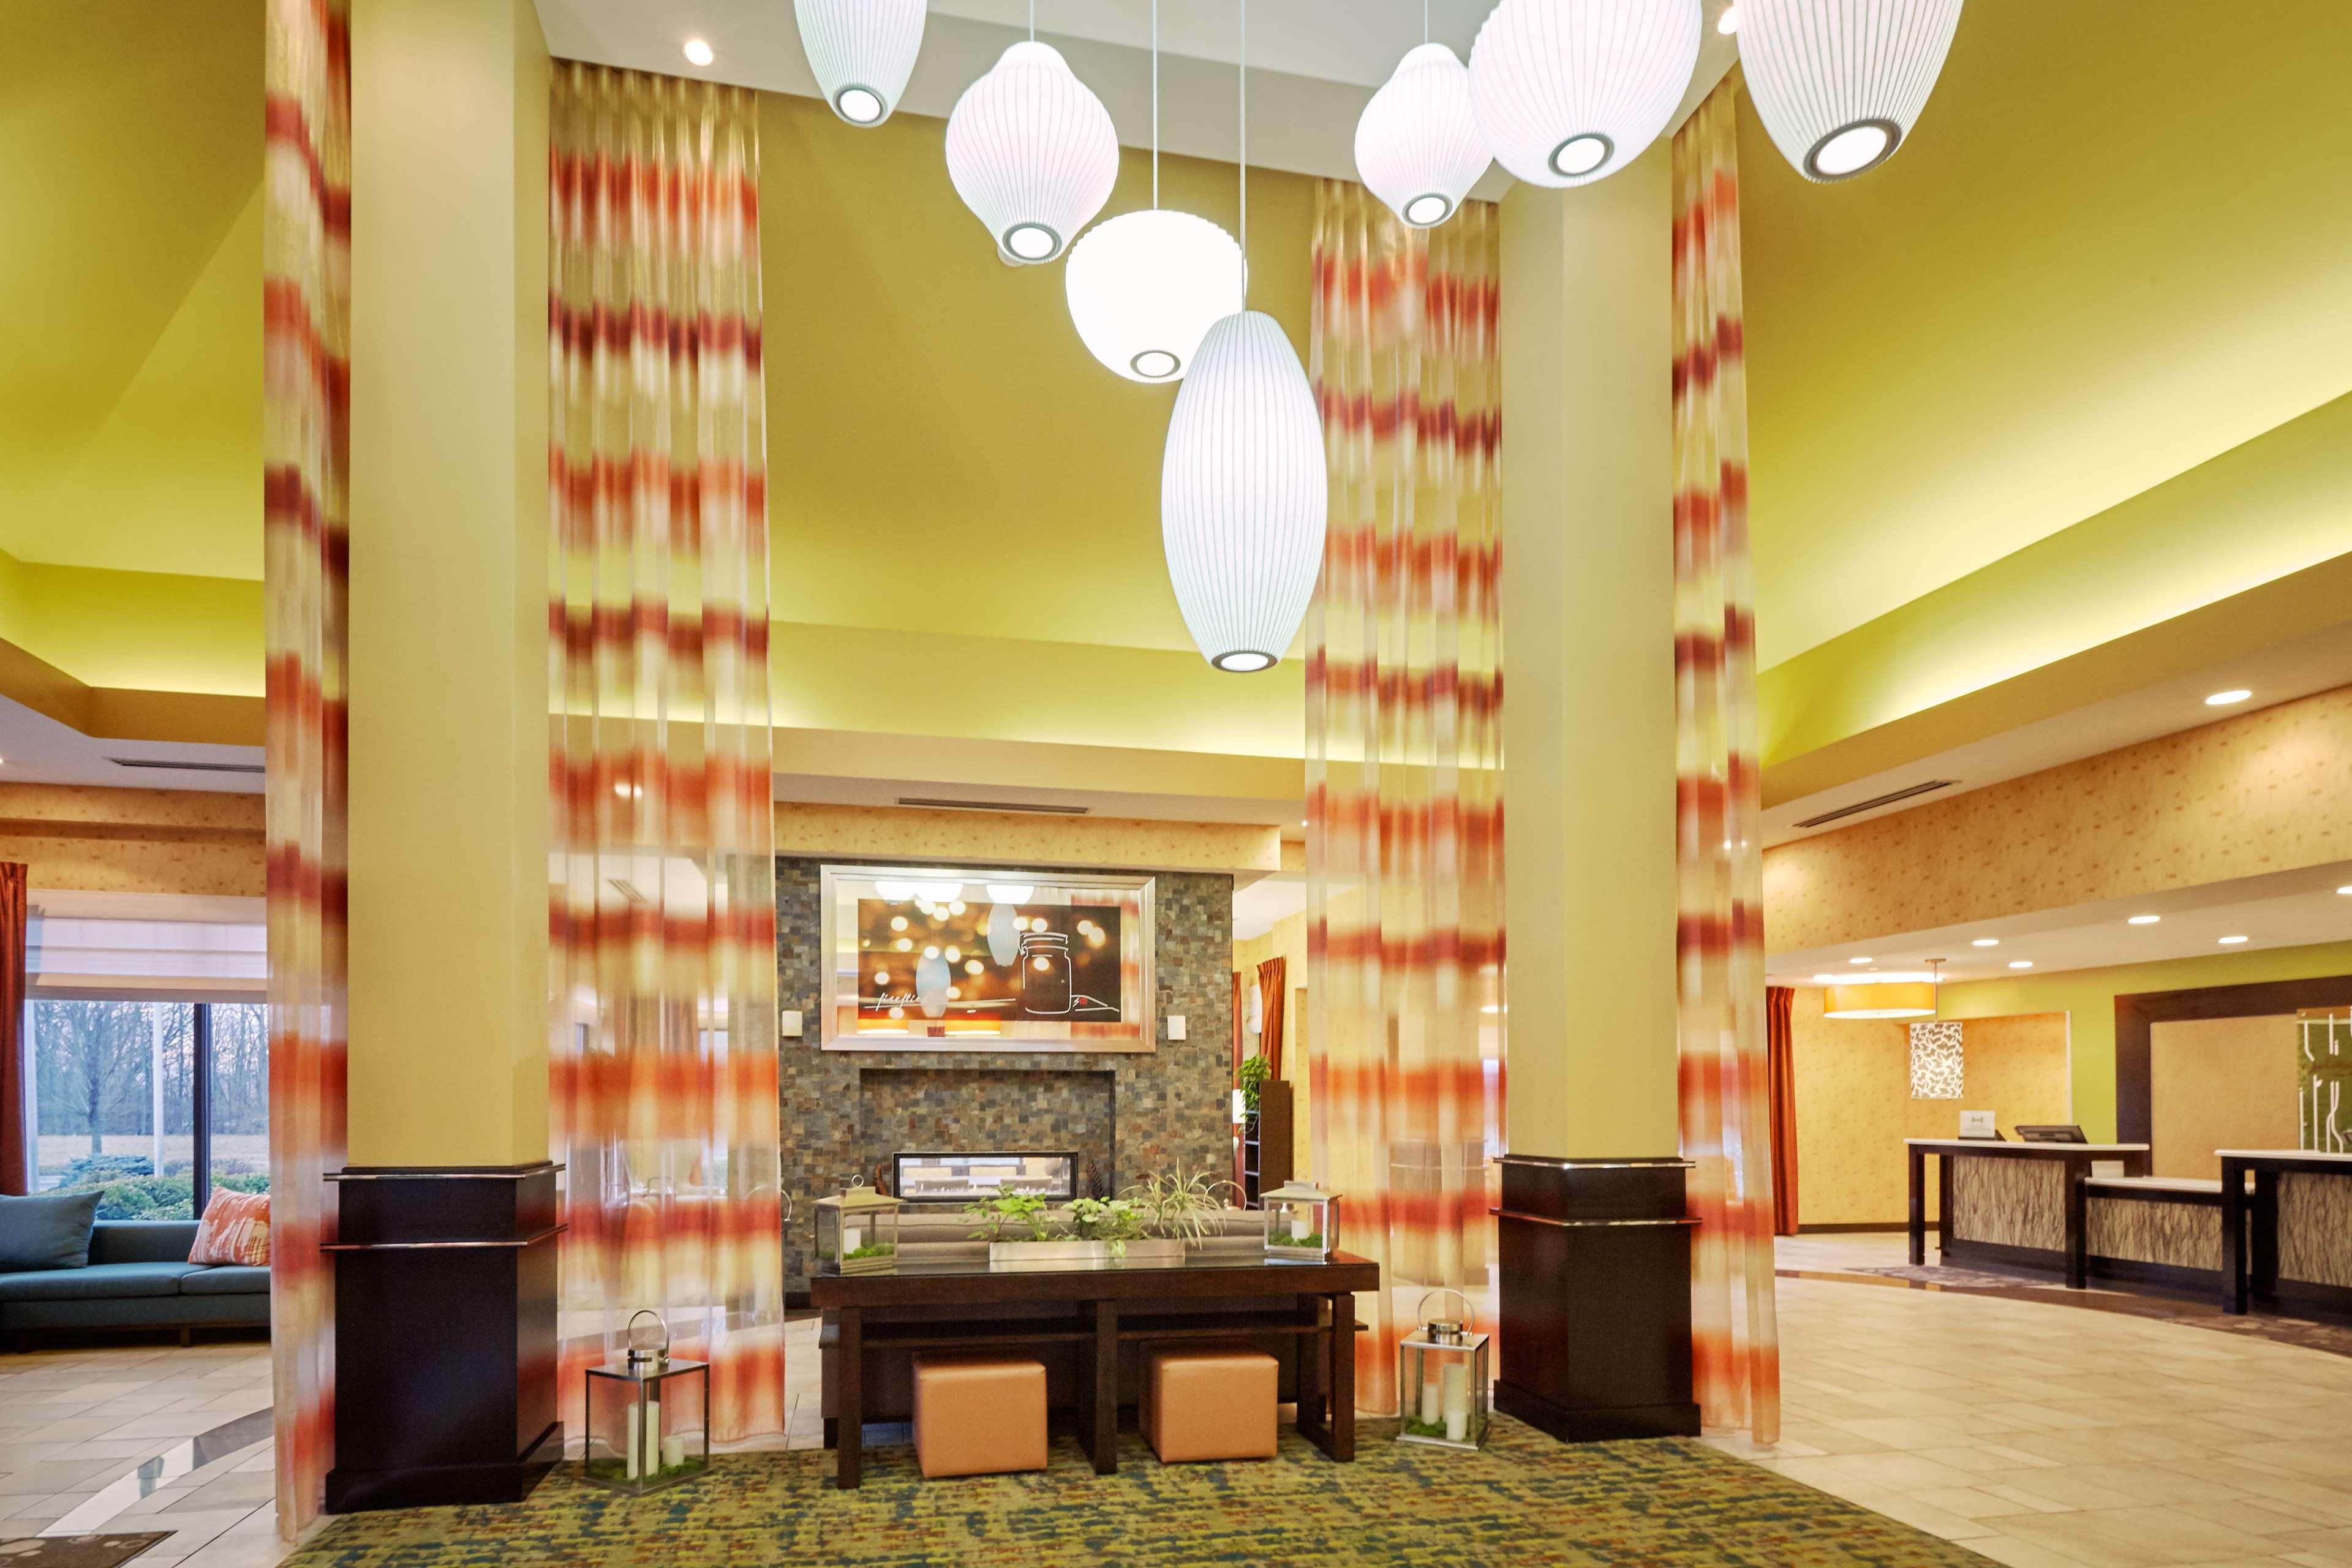 Hilton Garden Inn Indianapolis Northwest image 9